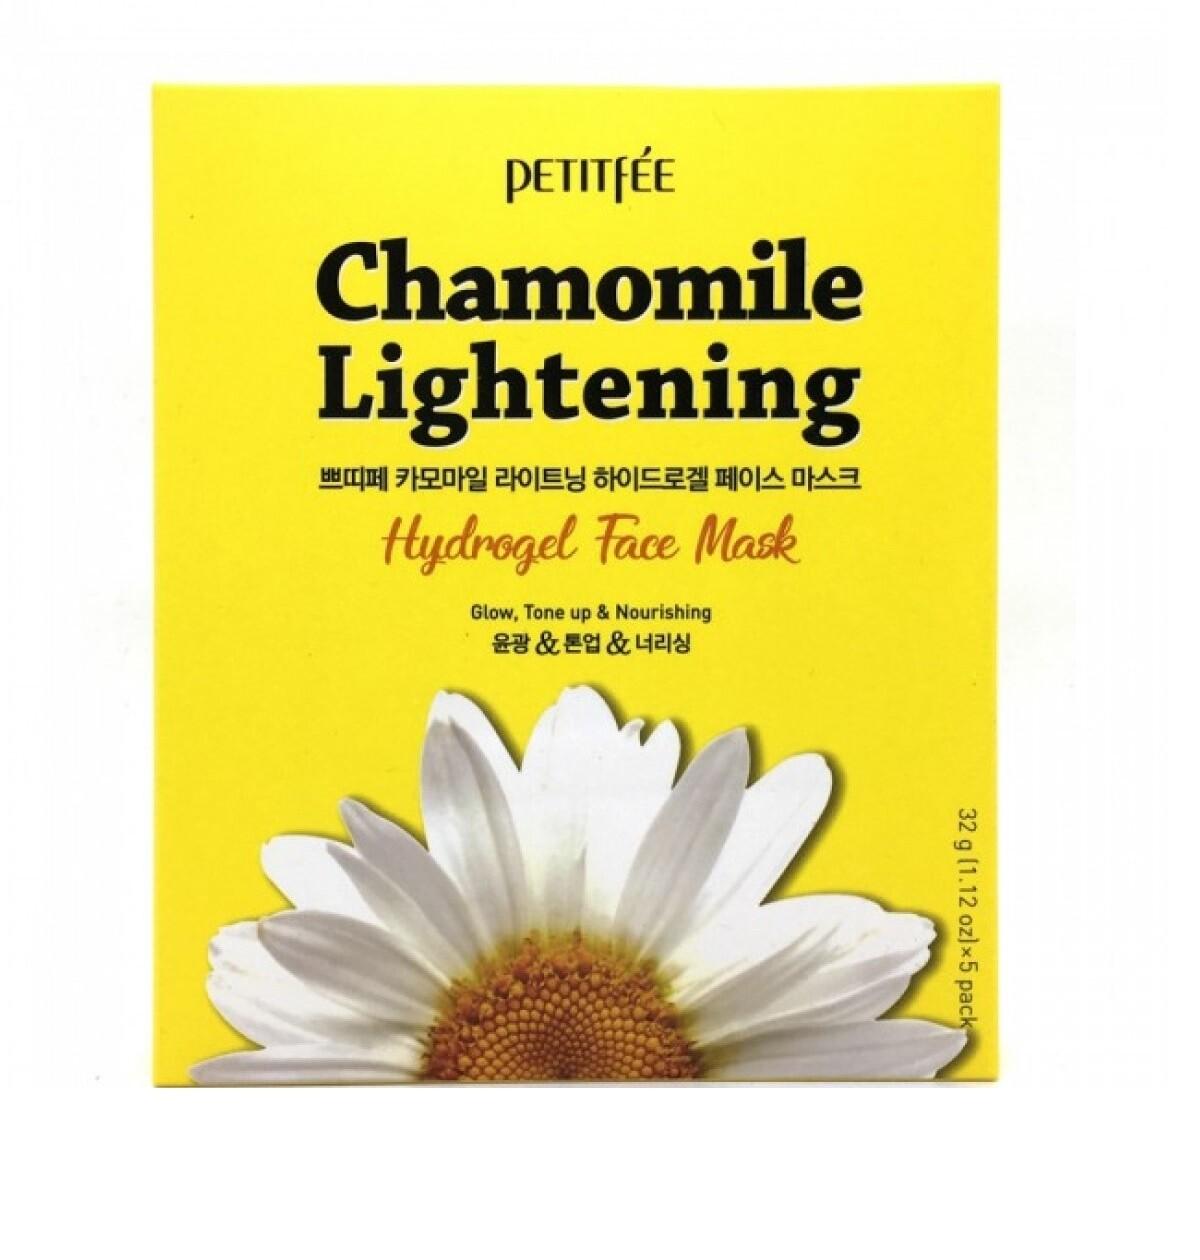 Гидрогелевая маска Petitfee Chamomile Lightening Hydrogel Face Mask 32 мл